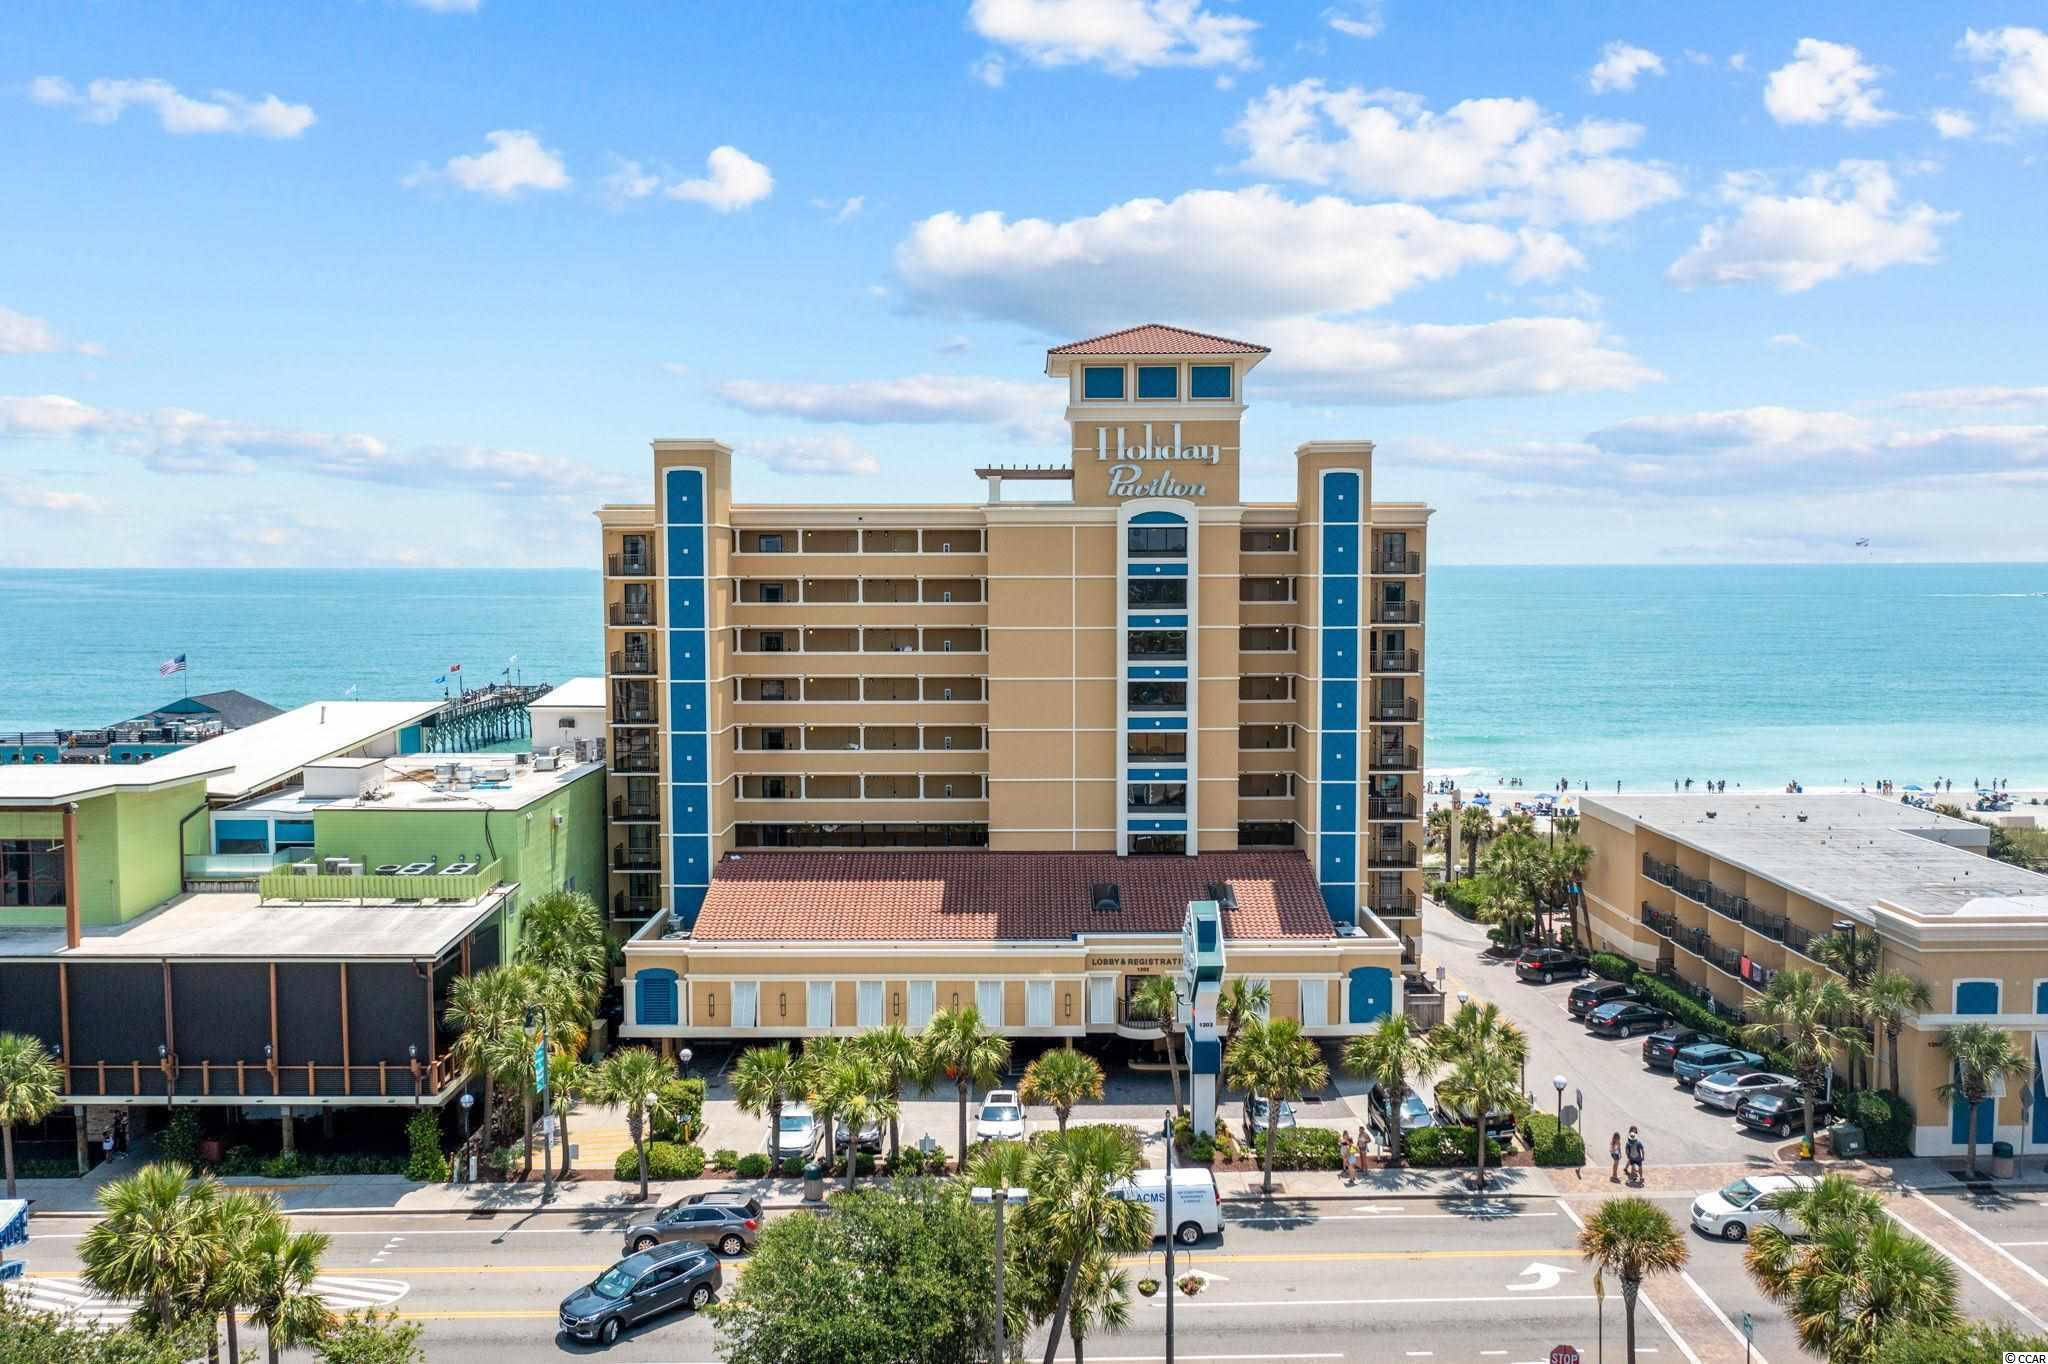 Holiday Inn- Pavilion- Mb Real Estate Listings Main Image